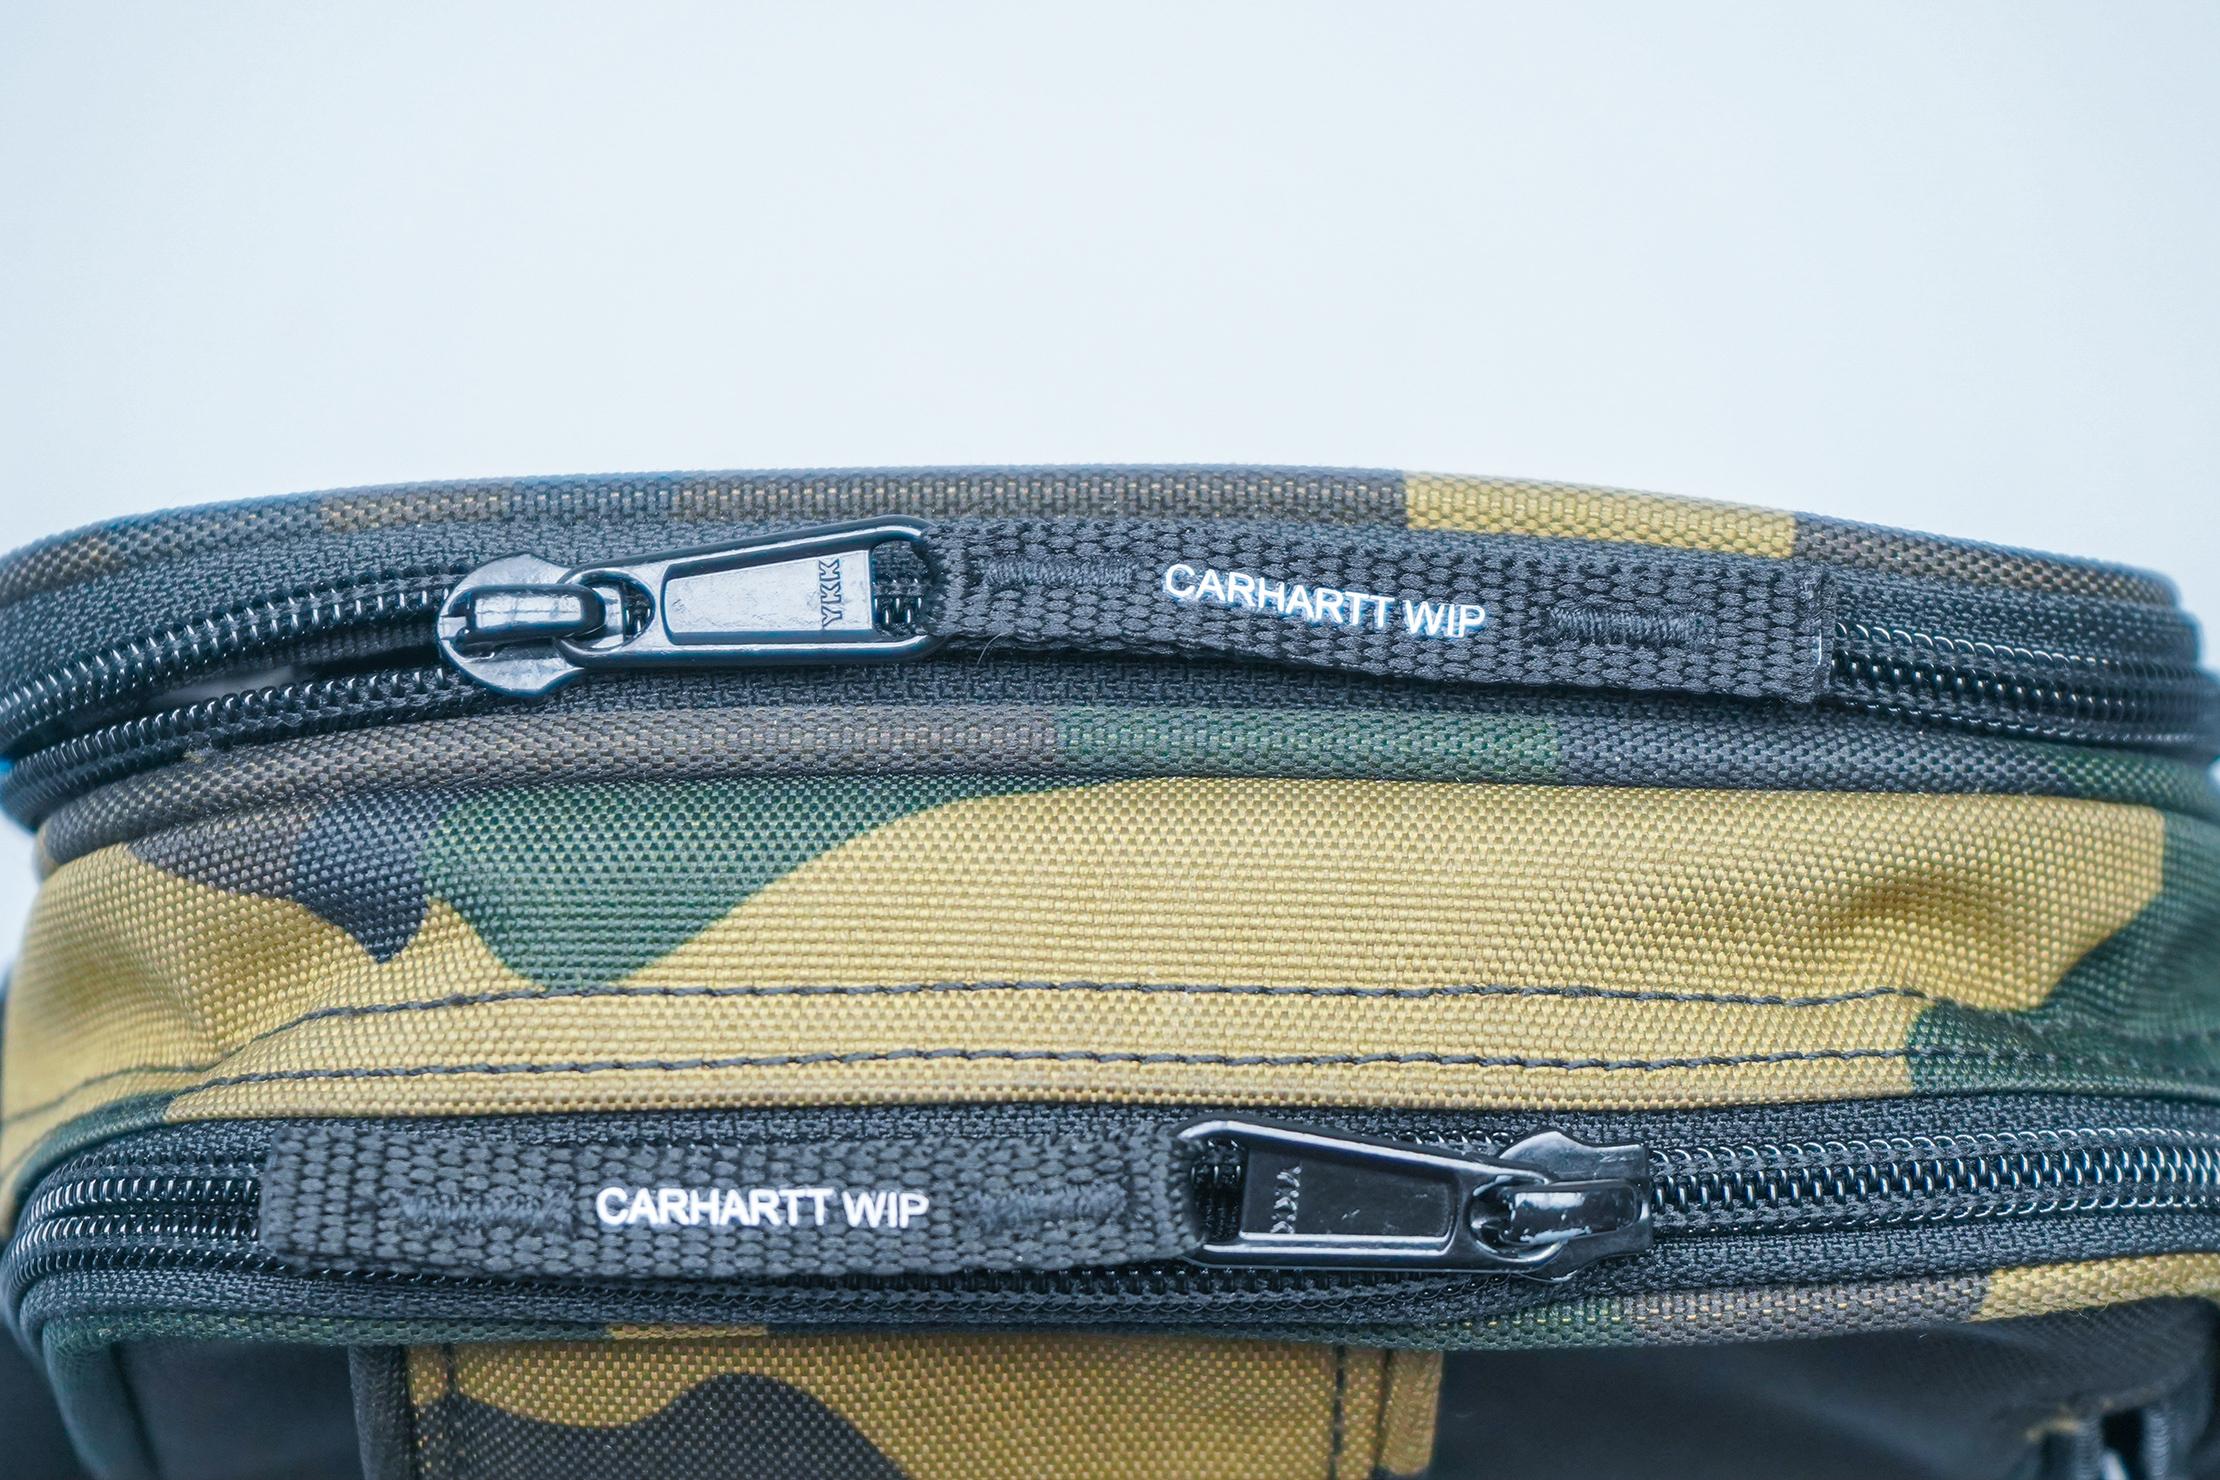 Carhartt WIP Essentials Bag YKK zippers